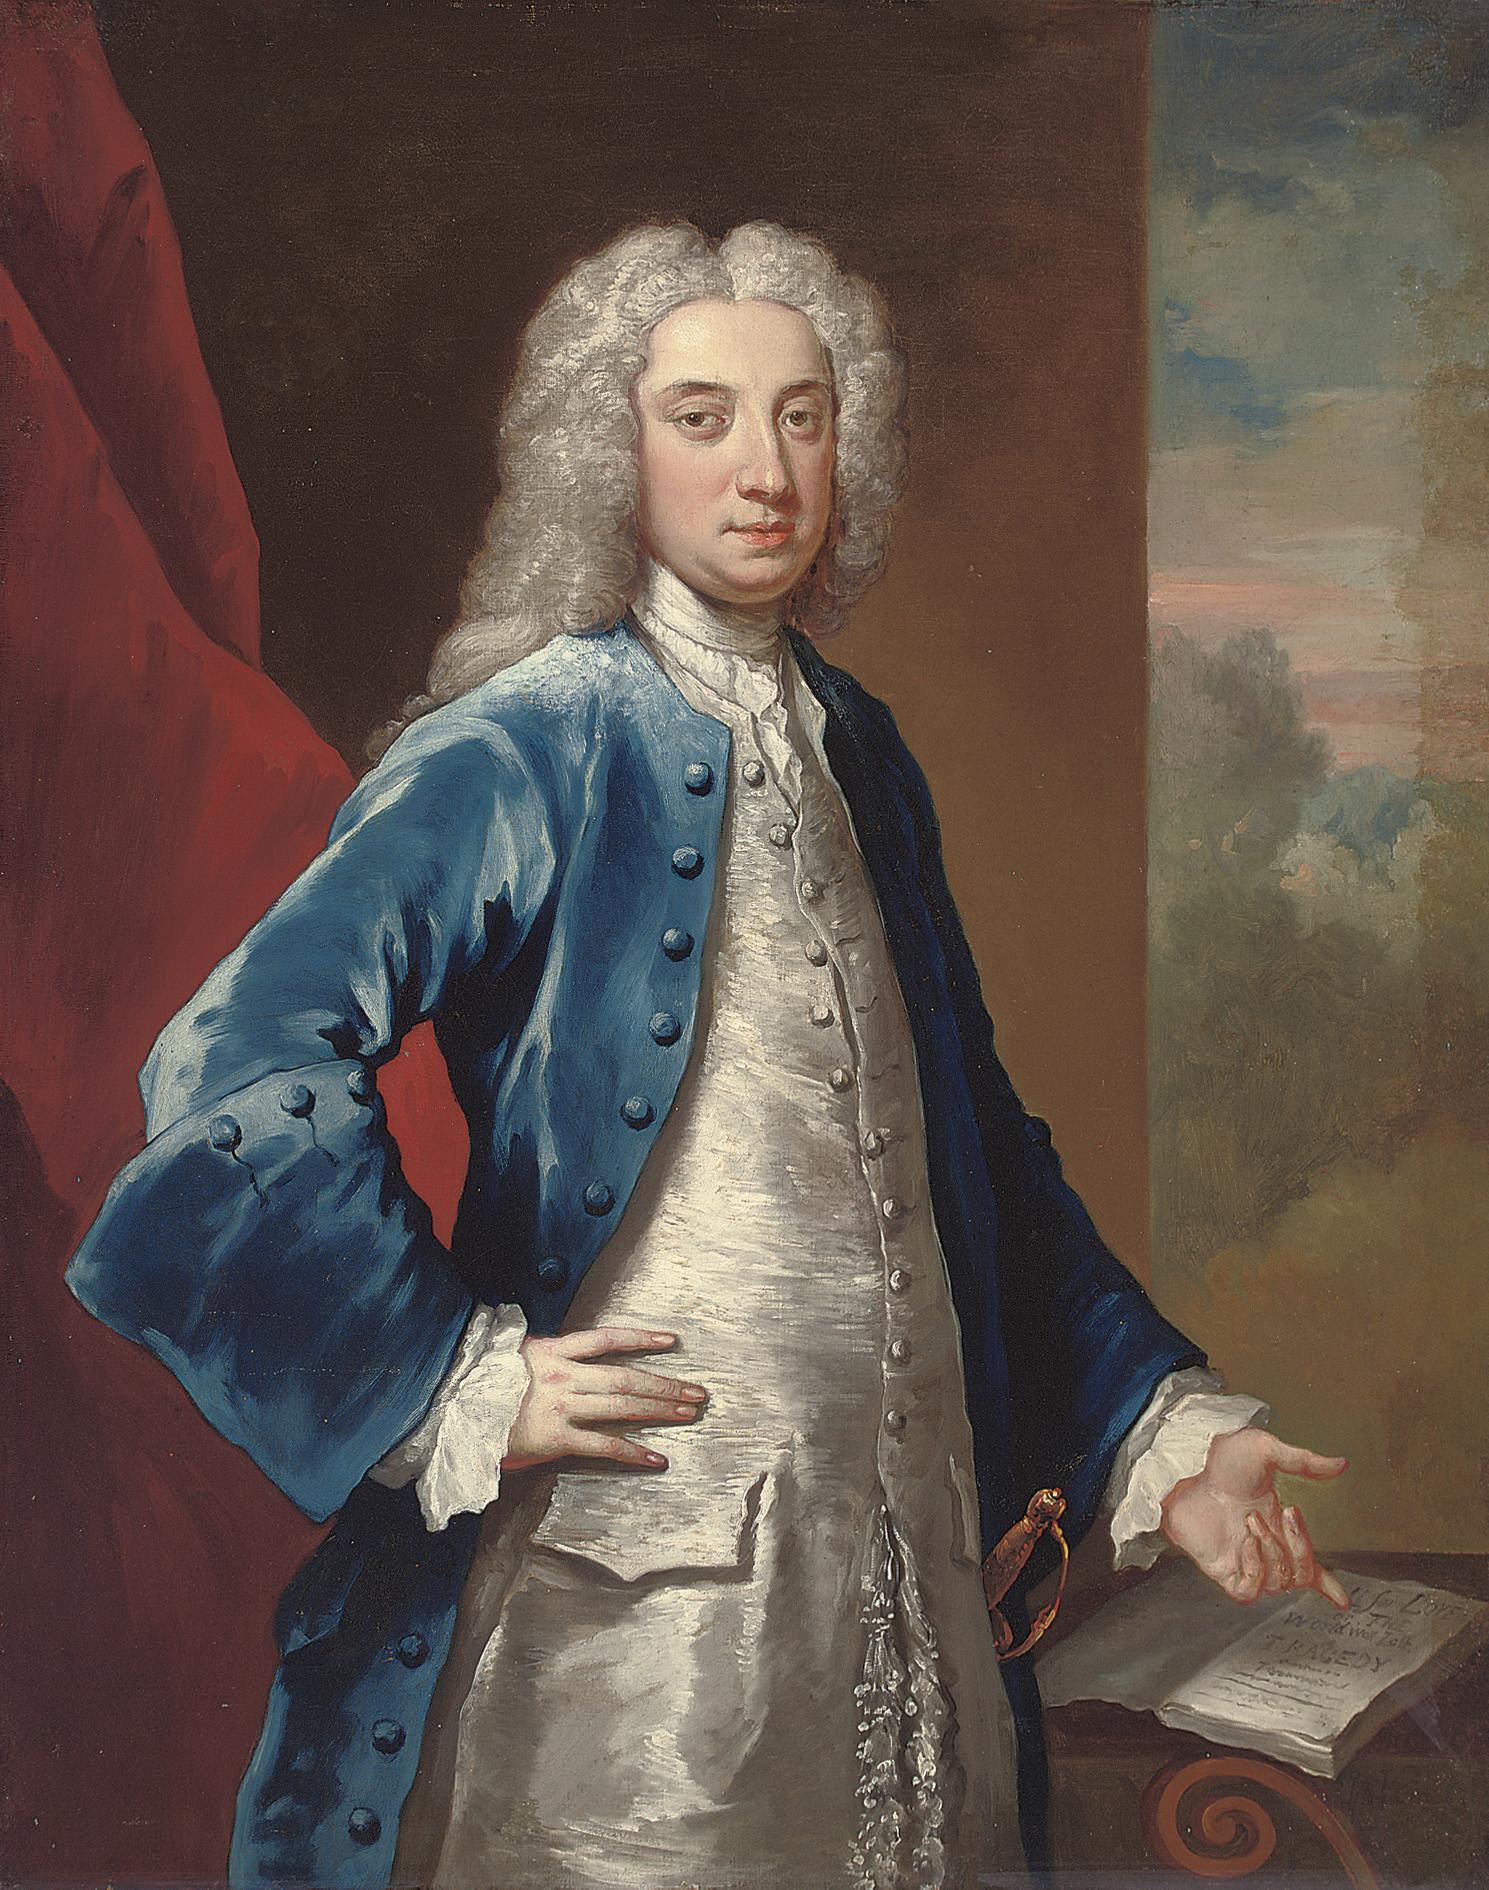 John Vanderbank (London 1694-1